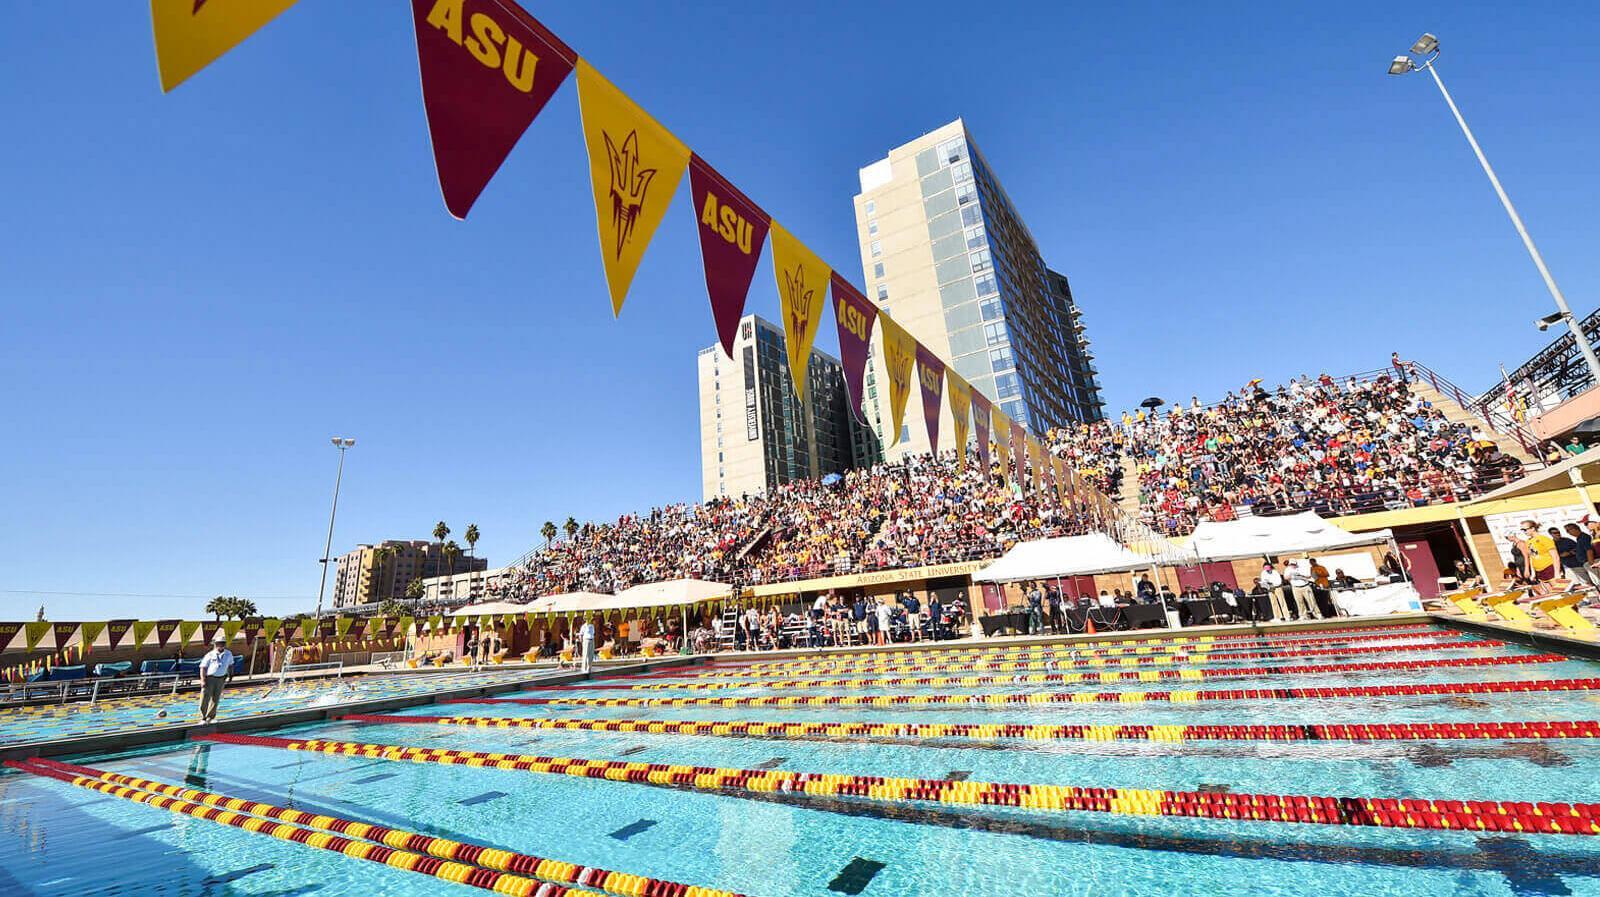 Celebratory ASU flags hang over the pool at Plummer Aquatic Center